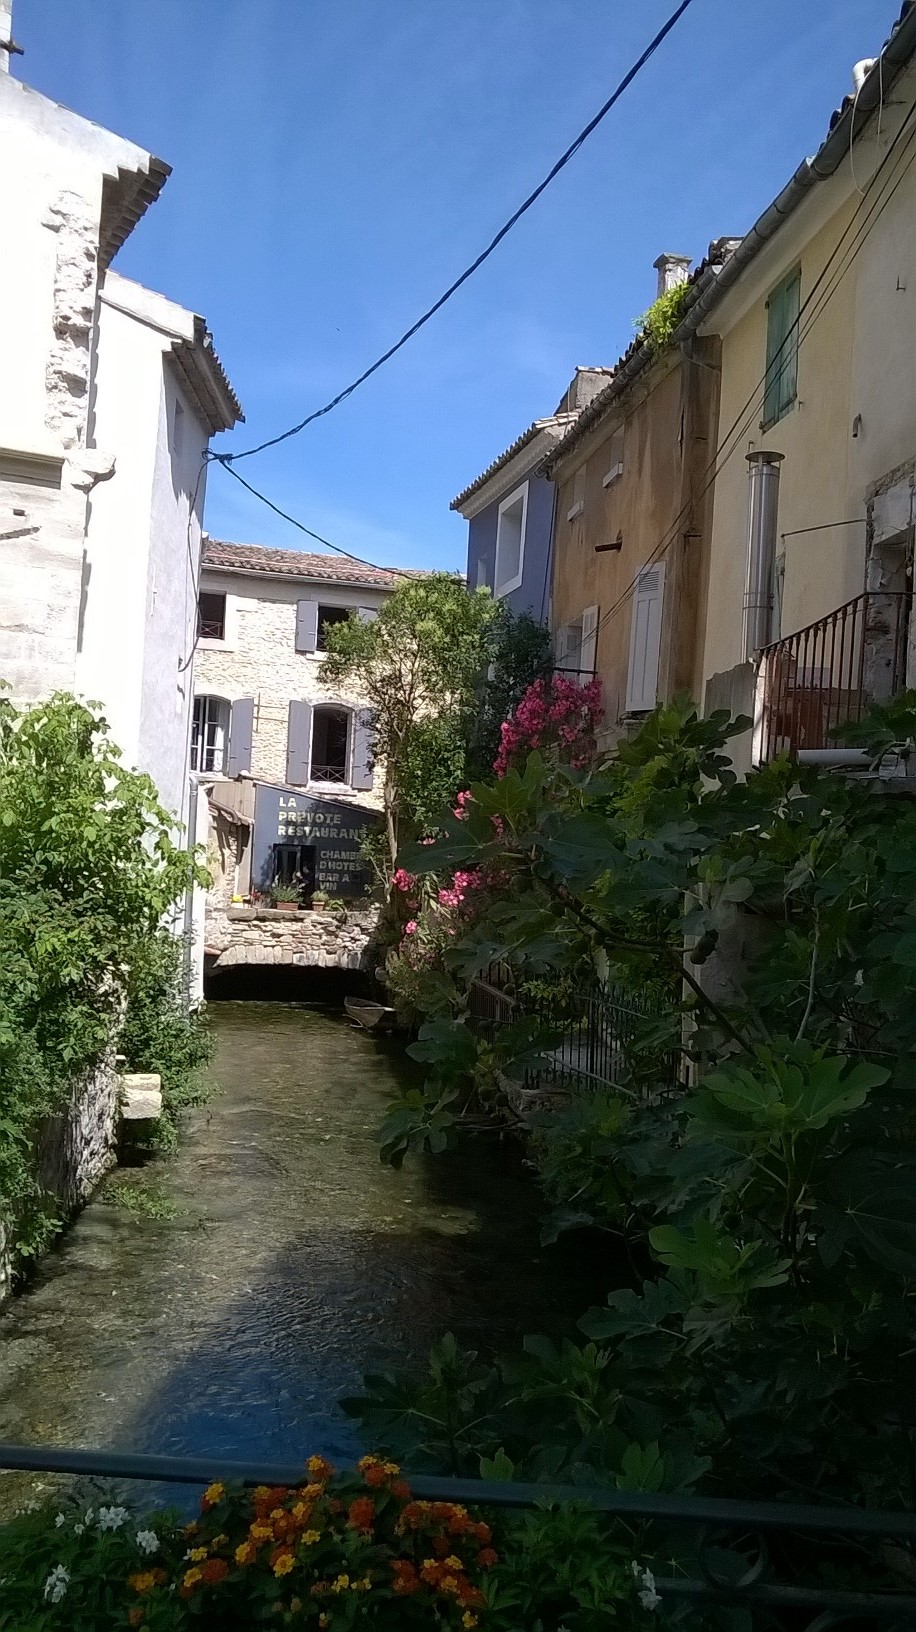 Voyage 2017 isle sur sorgue n 11